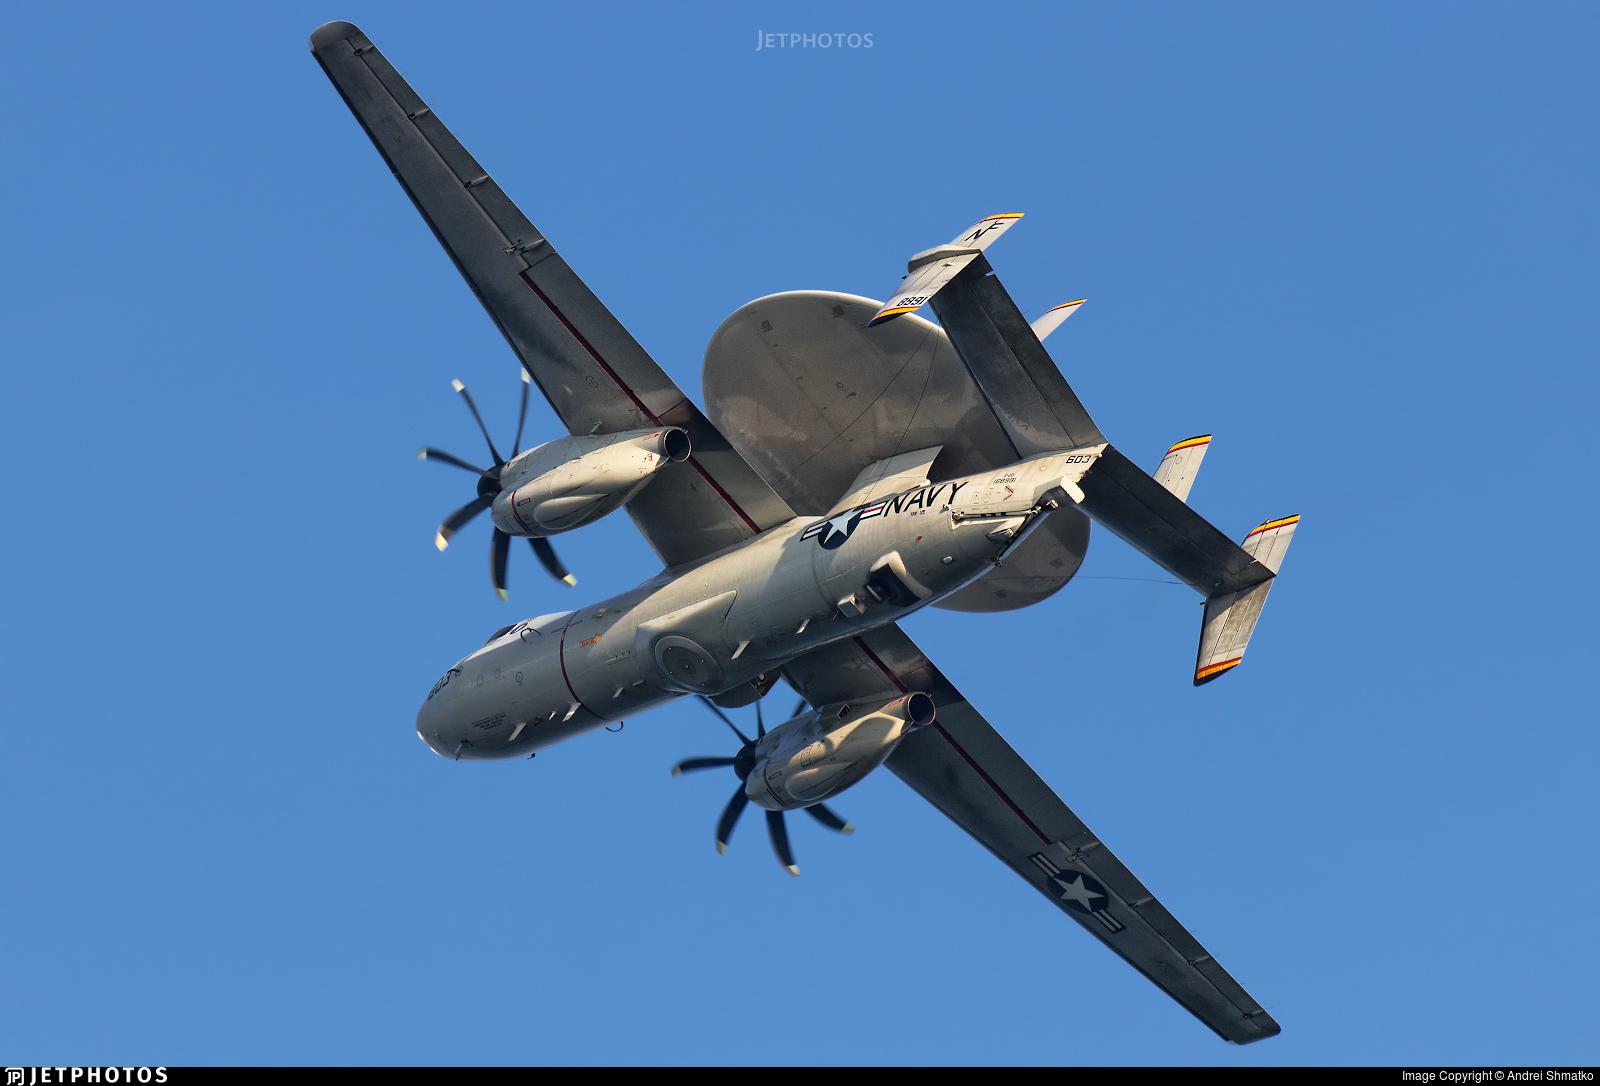 168991 - Grumman E-2D Advanced Hawkeye - United States - US Navy (USN)